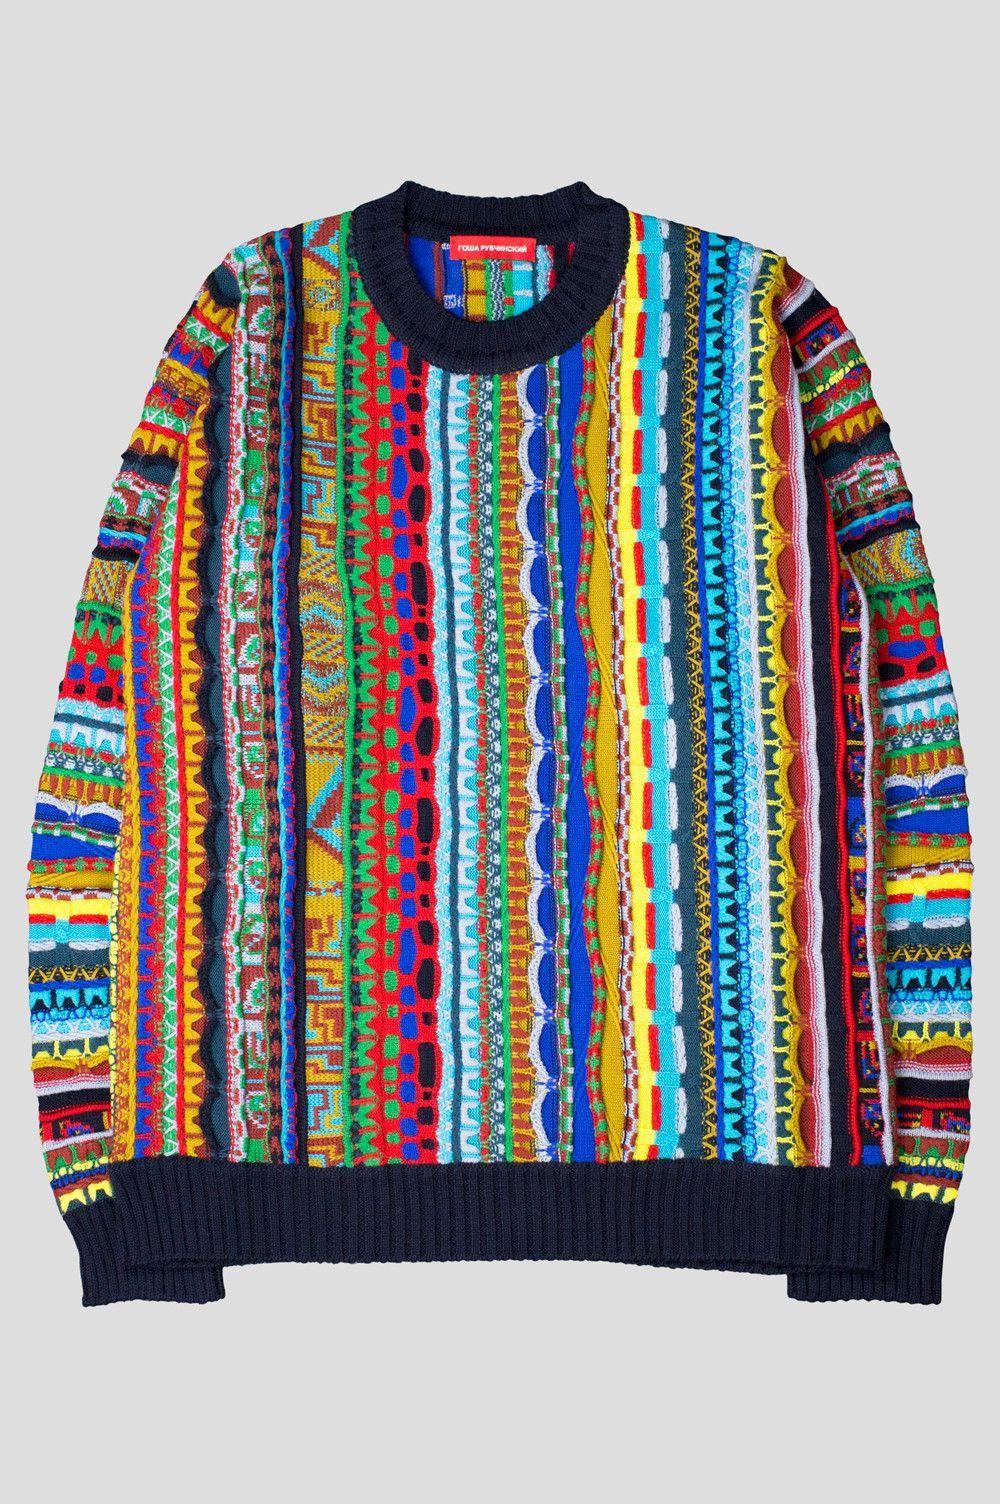 Gosha rubchinskiy wool acrylic sweater black multi | Gosha ...